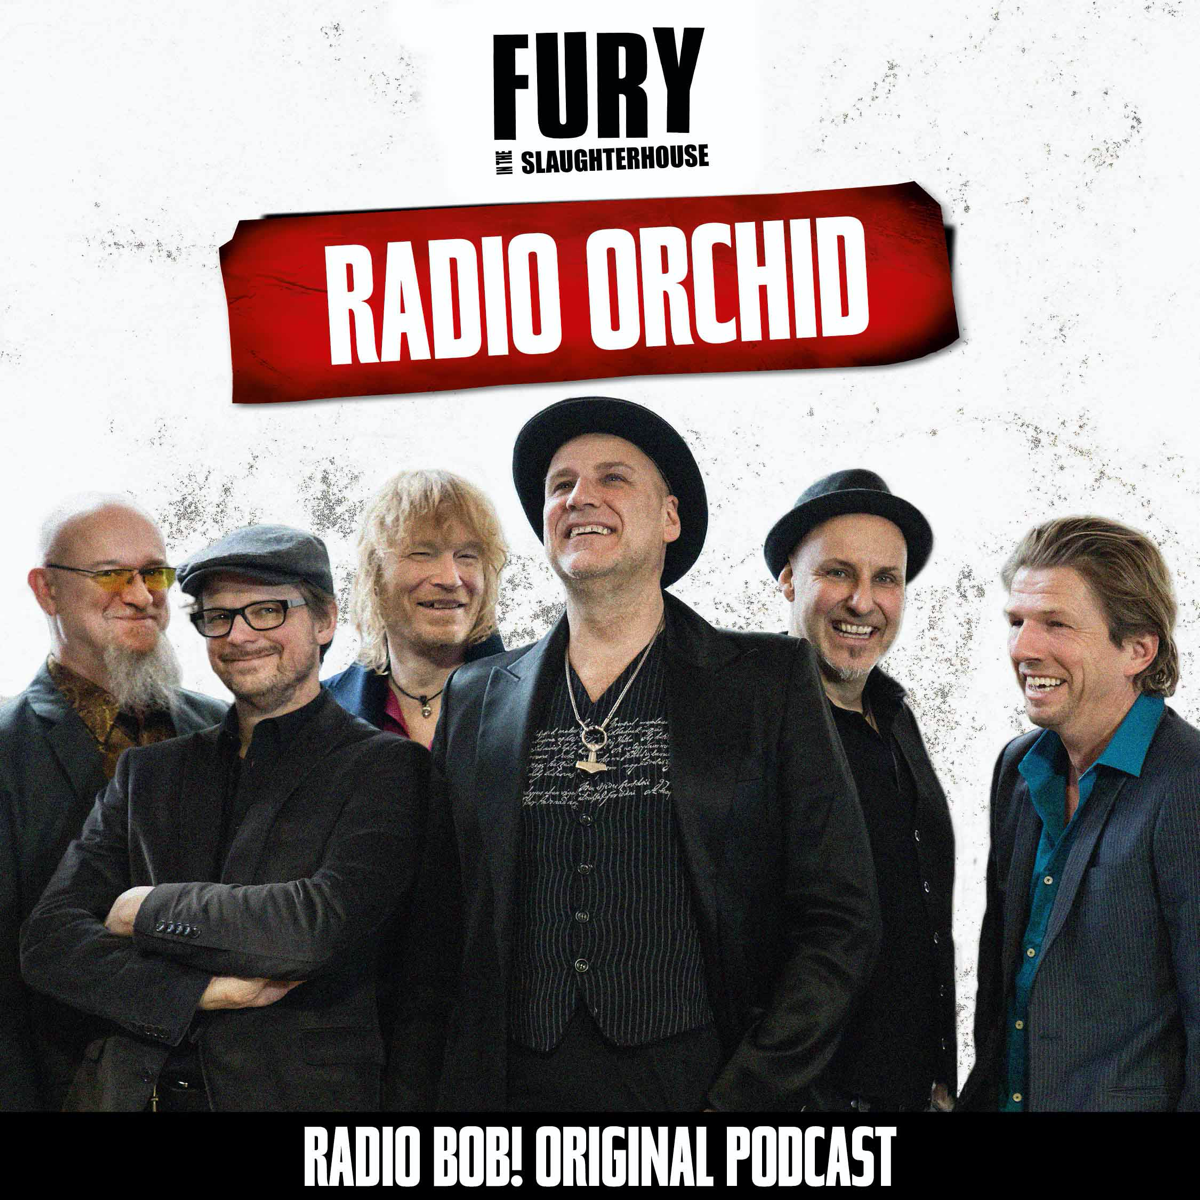 """RADIO ORCHID"" geht am 17. Mai bei RADIO BOB! on air"